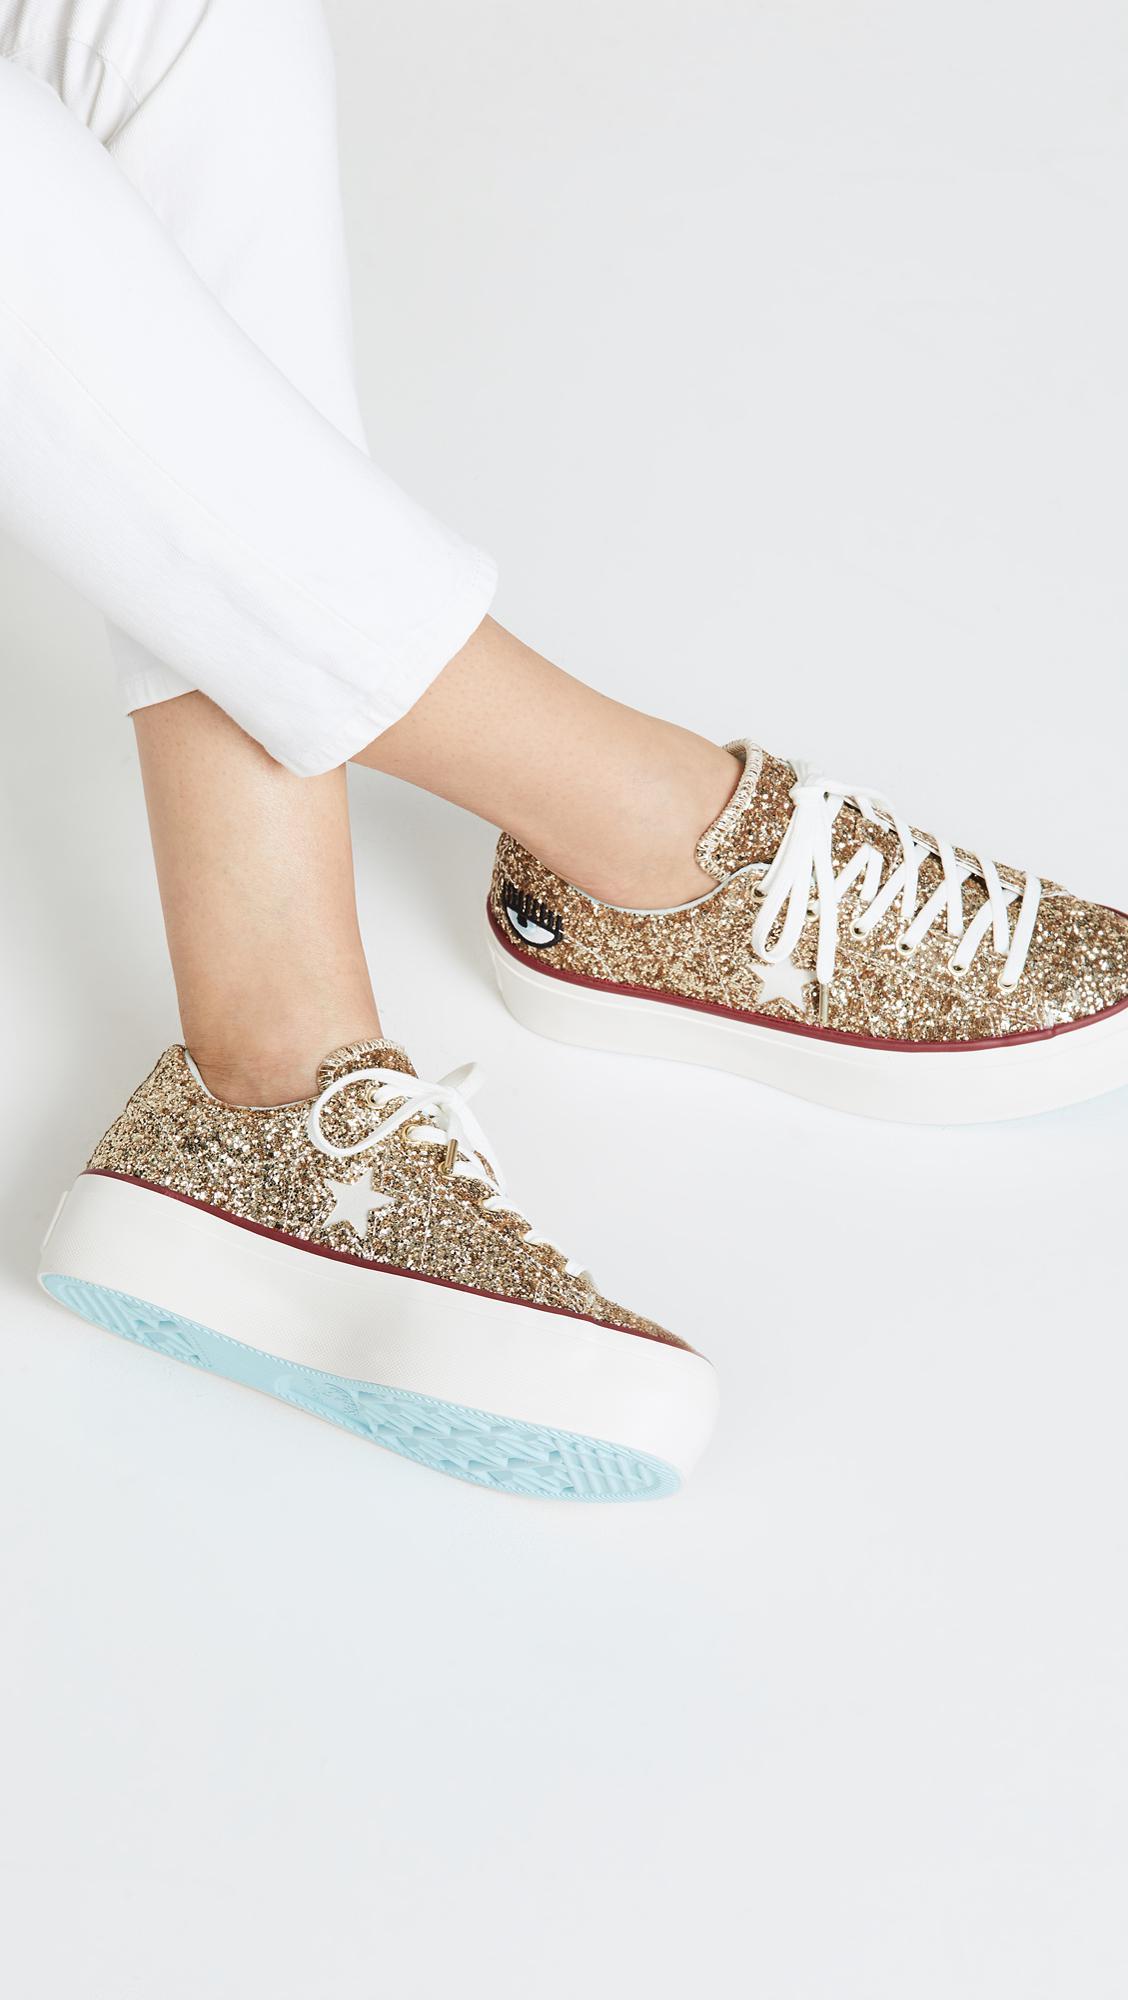 Converse Metallic One Star X Chiara Ferragni Lace Up Sneakers